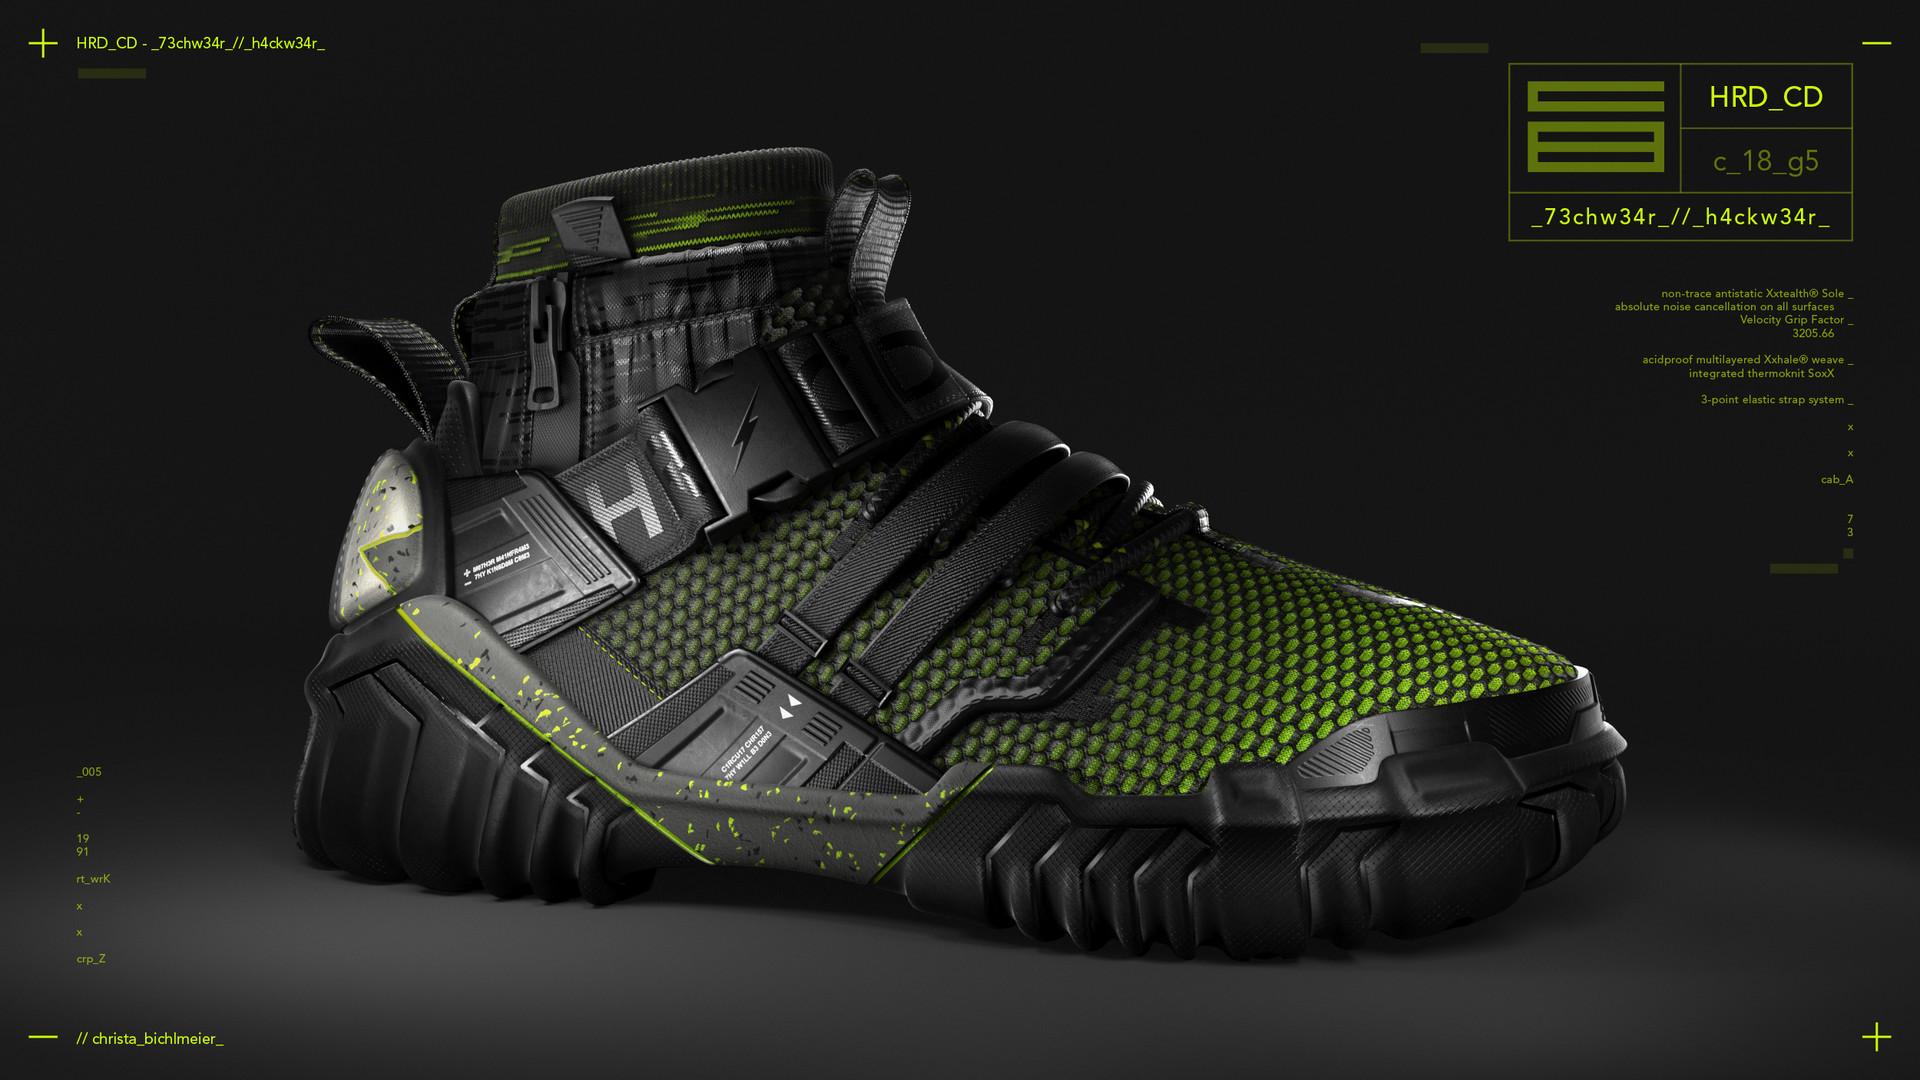 christa-bichlmeier-christa-bichlmeier-techwear-hackwear-shoes-beauty-cam-03 - Copy.jpg